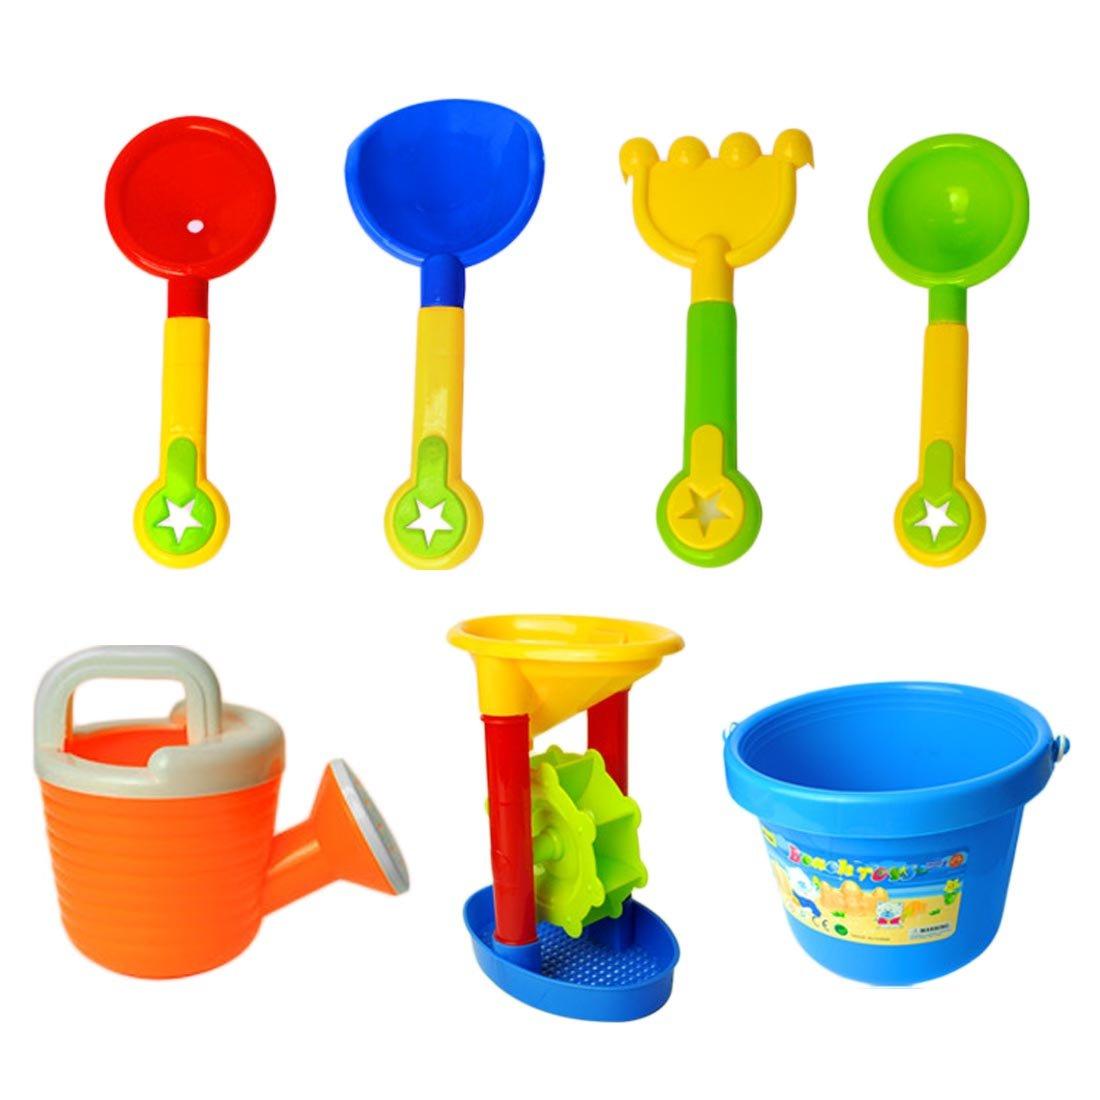 Ruefree 13pc Kids Beach Toys Set, Sandbox Toys, Sand Toys